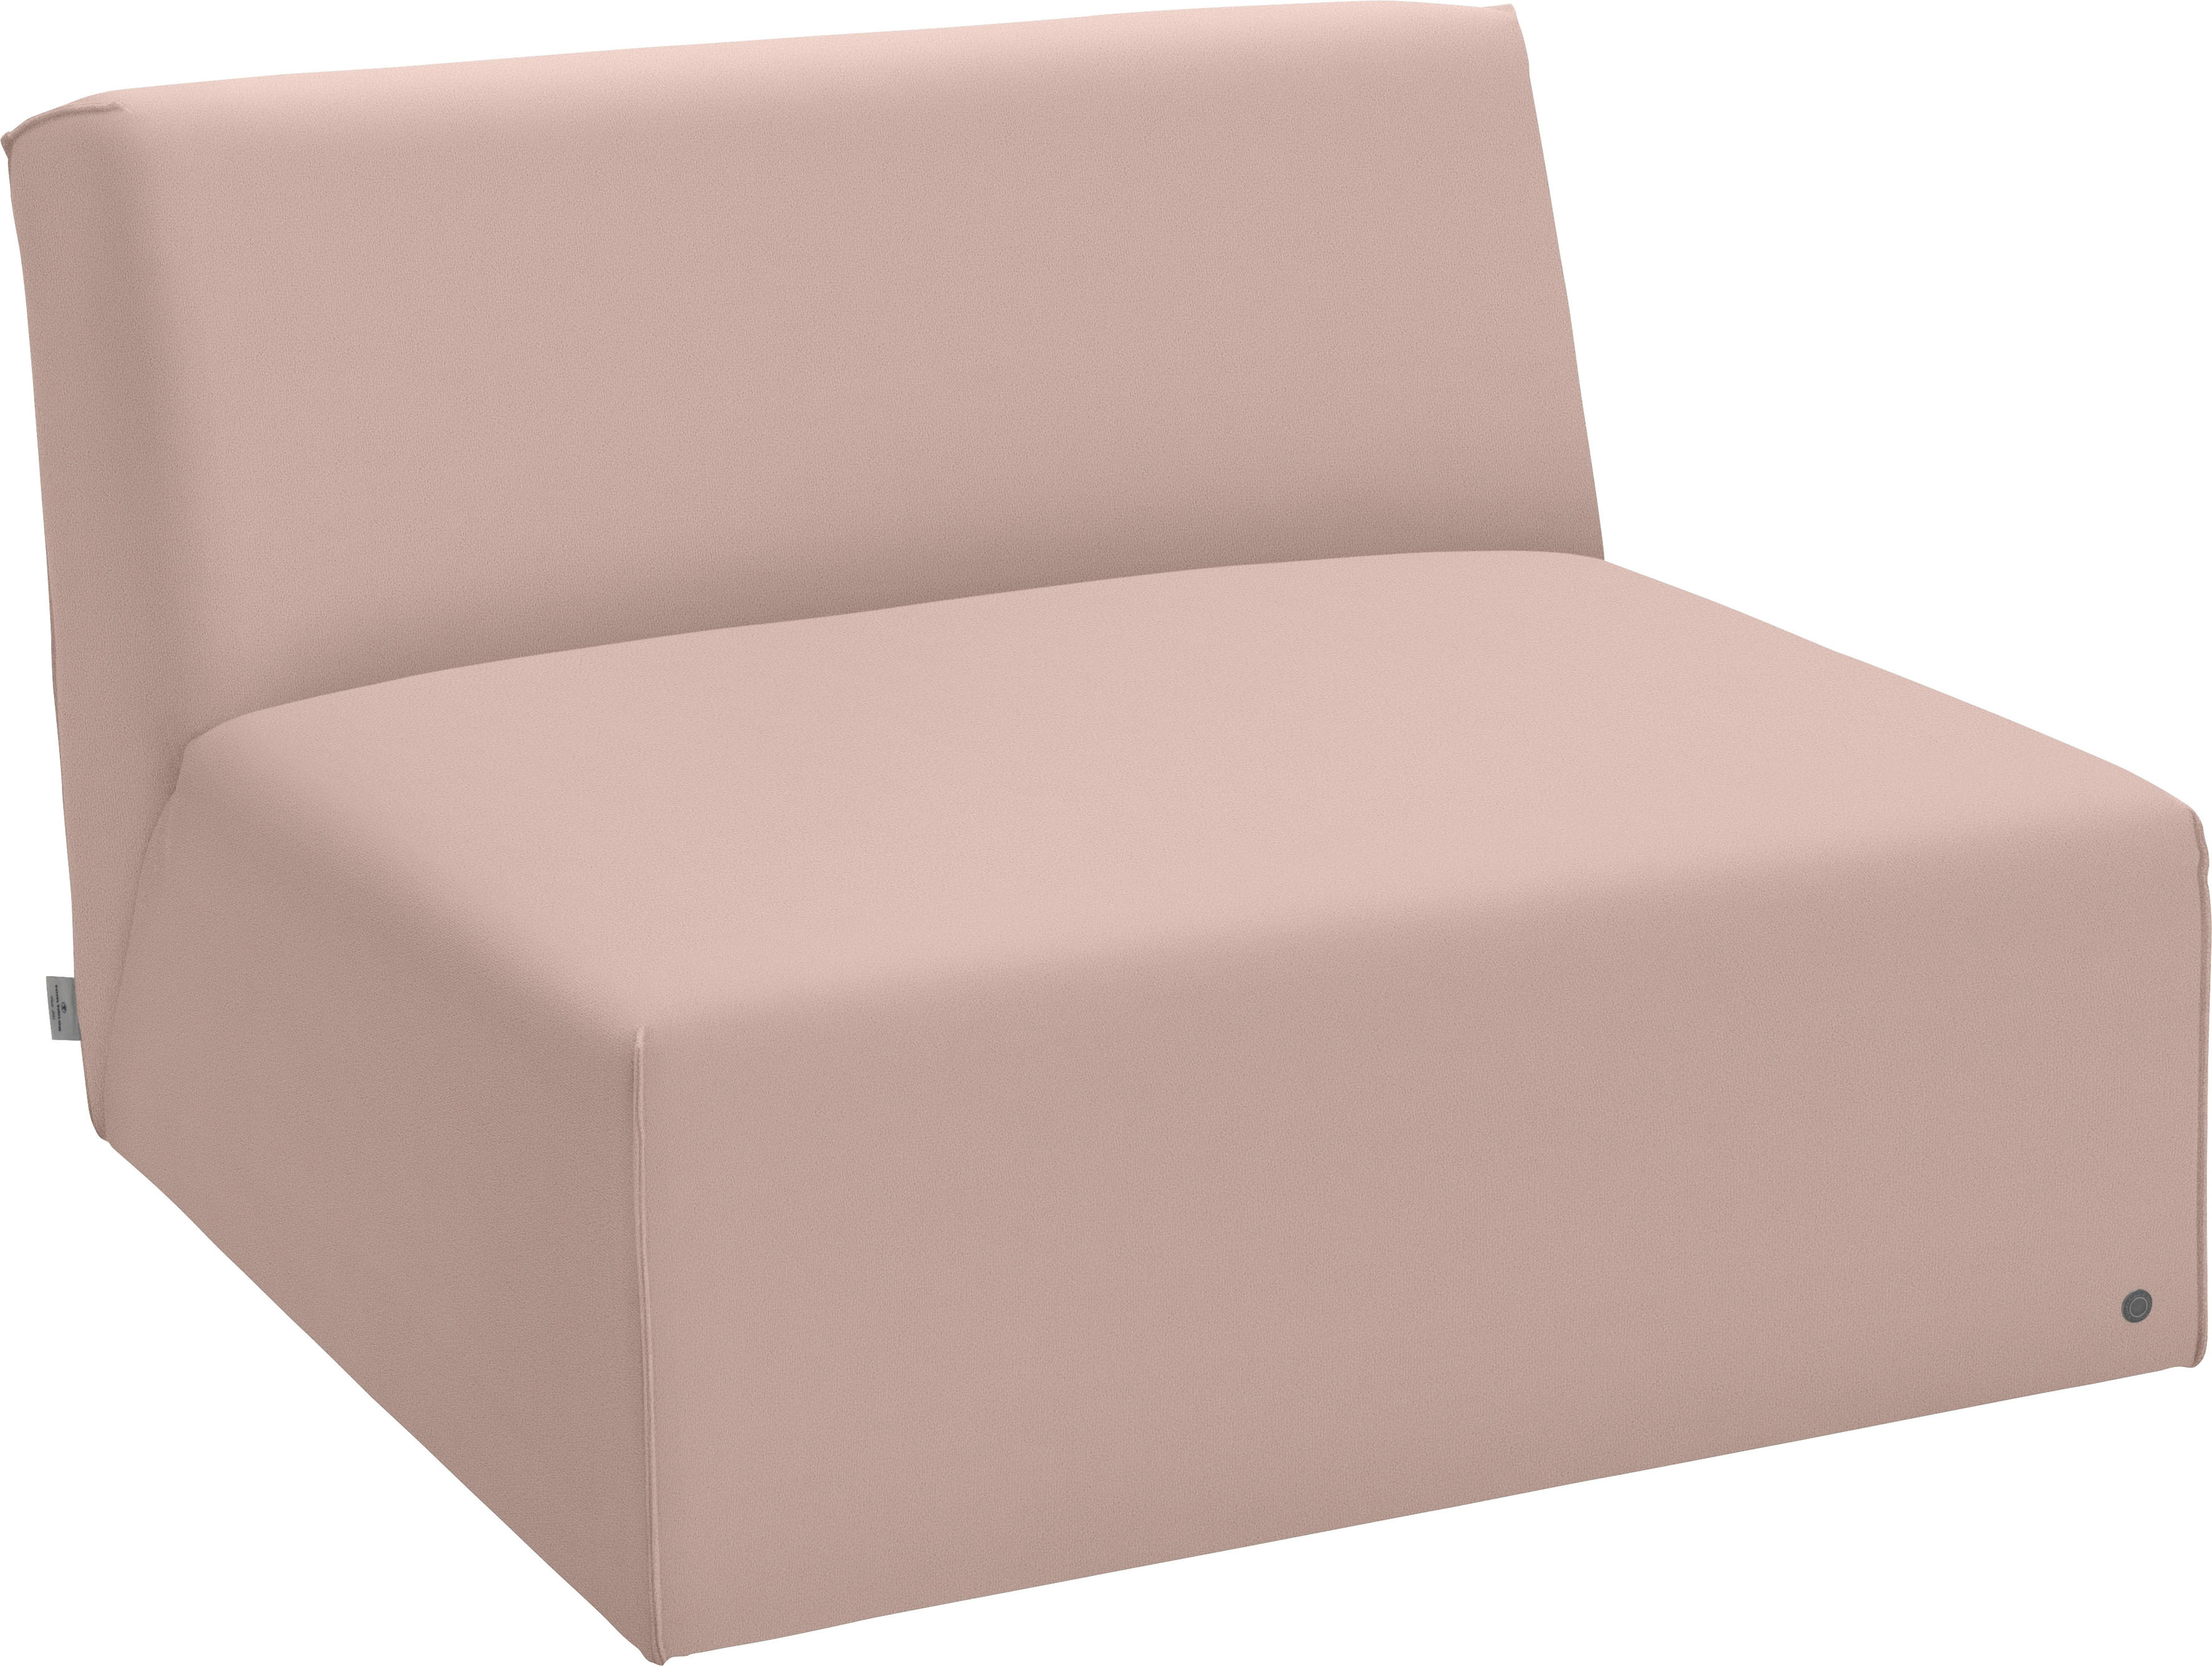 TOM TAILOR Sofaelement ELEMENTS, Sitzelement ohne Armlehne rosa Sofaelemente Sofas Couches